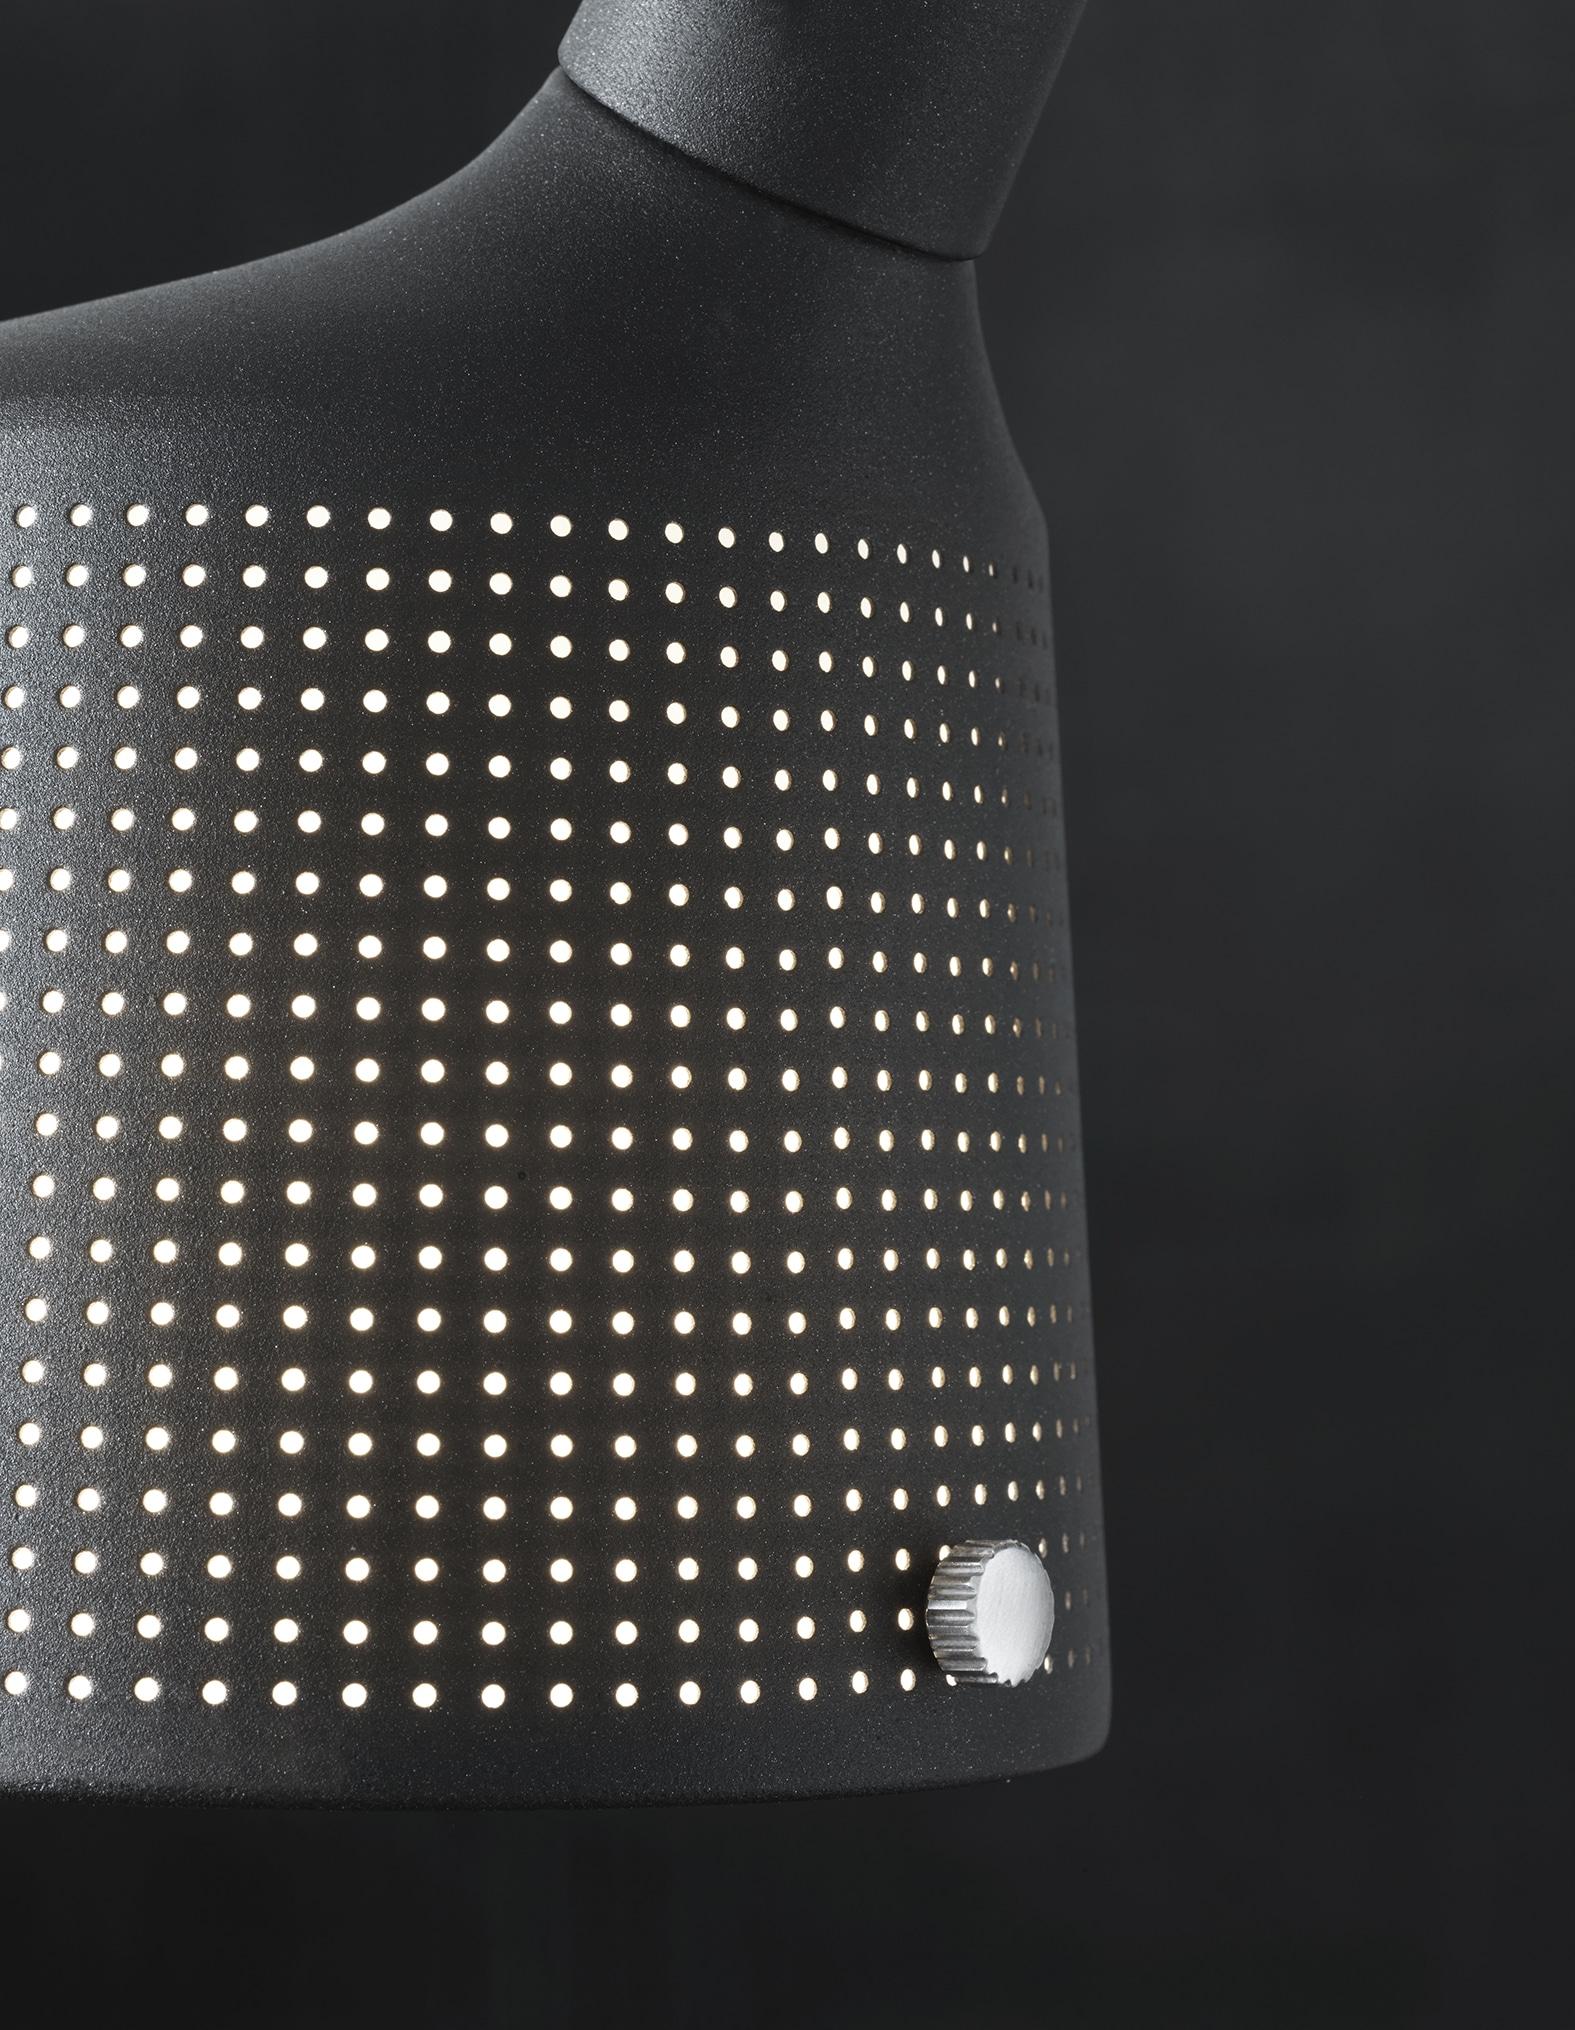 vipp black lamp detail low